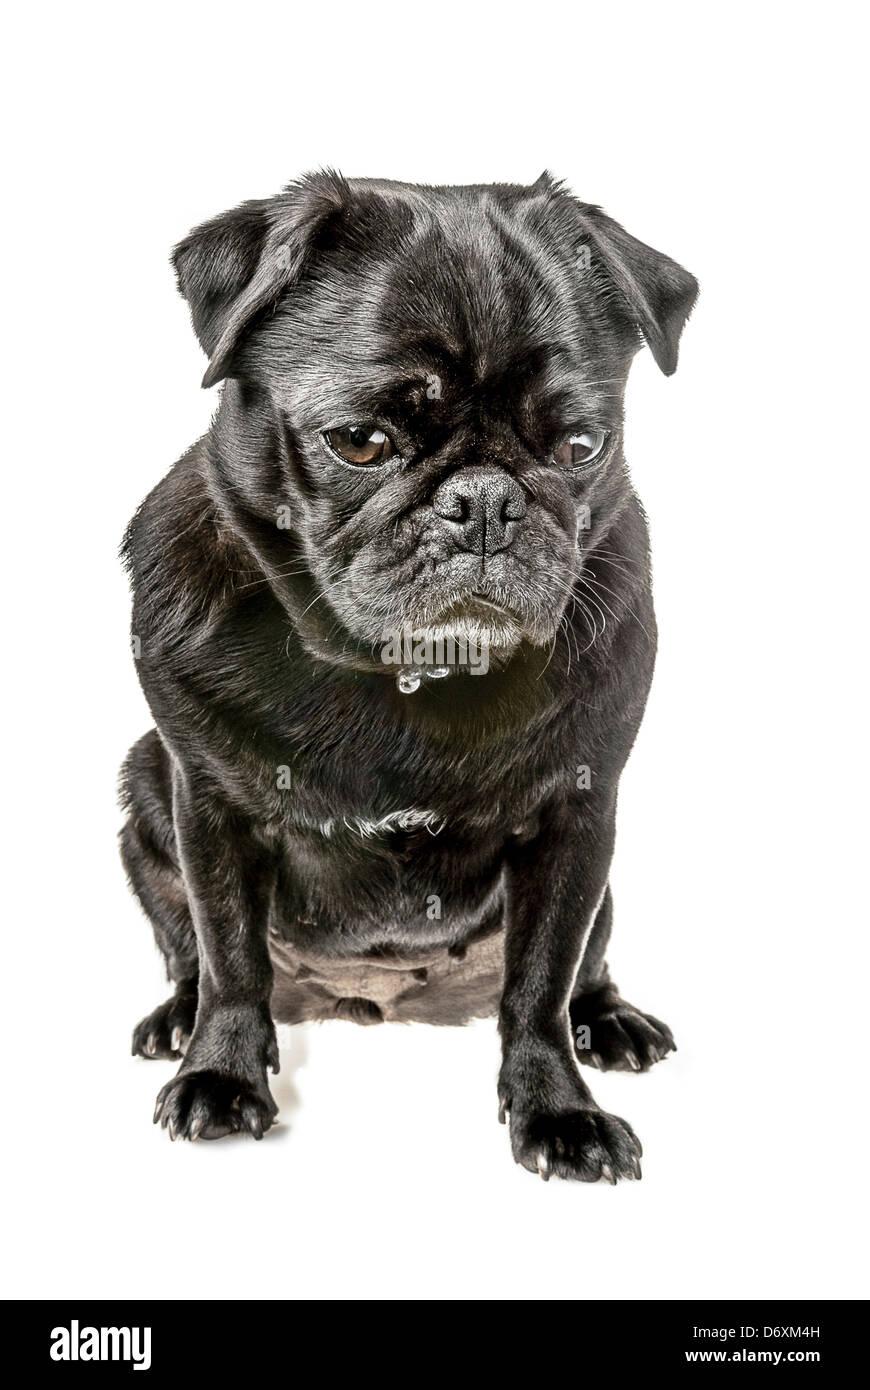 Black pug, sitting with a sad look - Stock Image